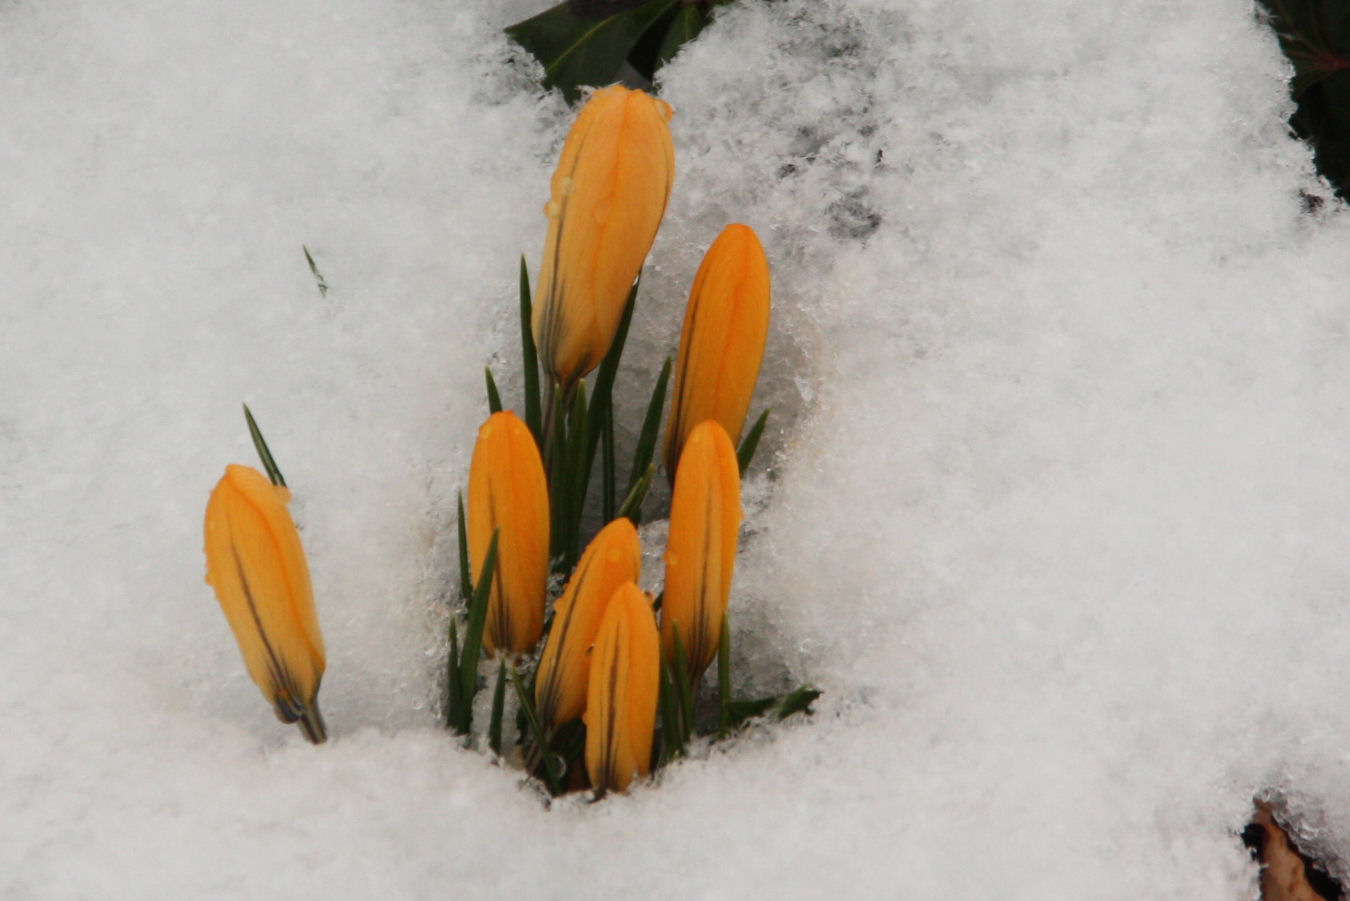 Wann wird es mal riechtig Frühling Hä?